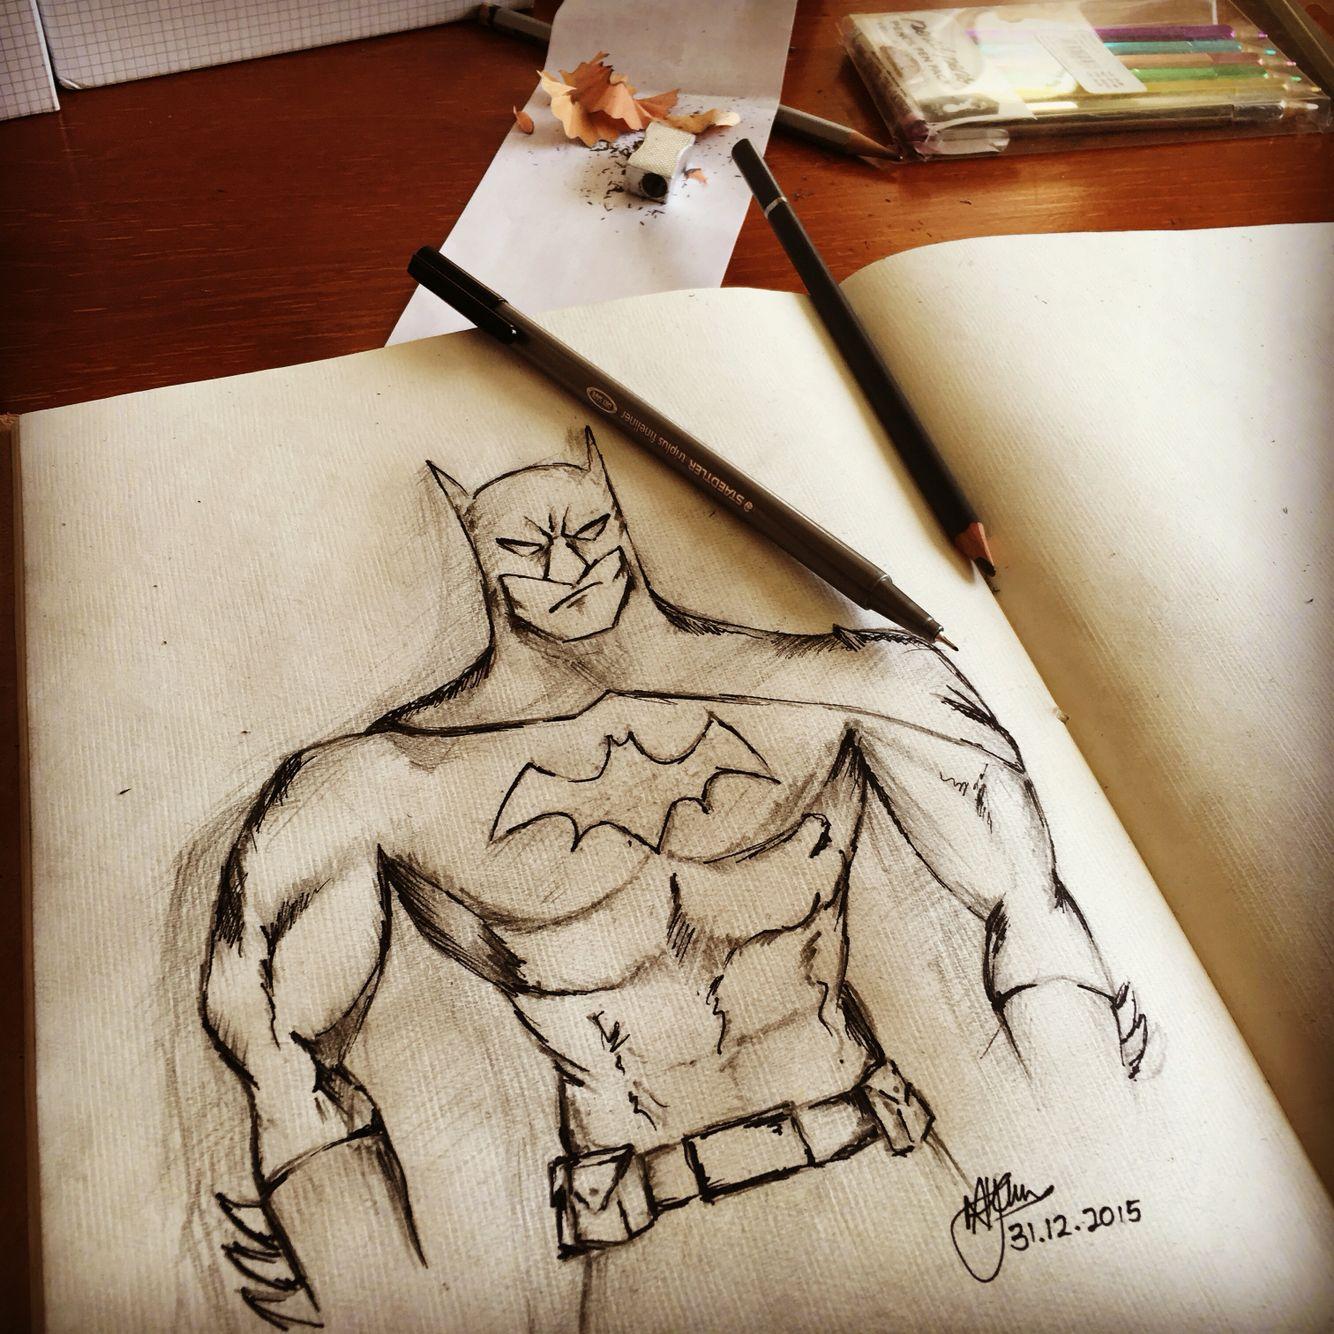 Batman Sketch ink and pencil